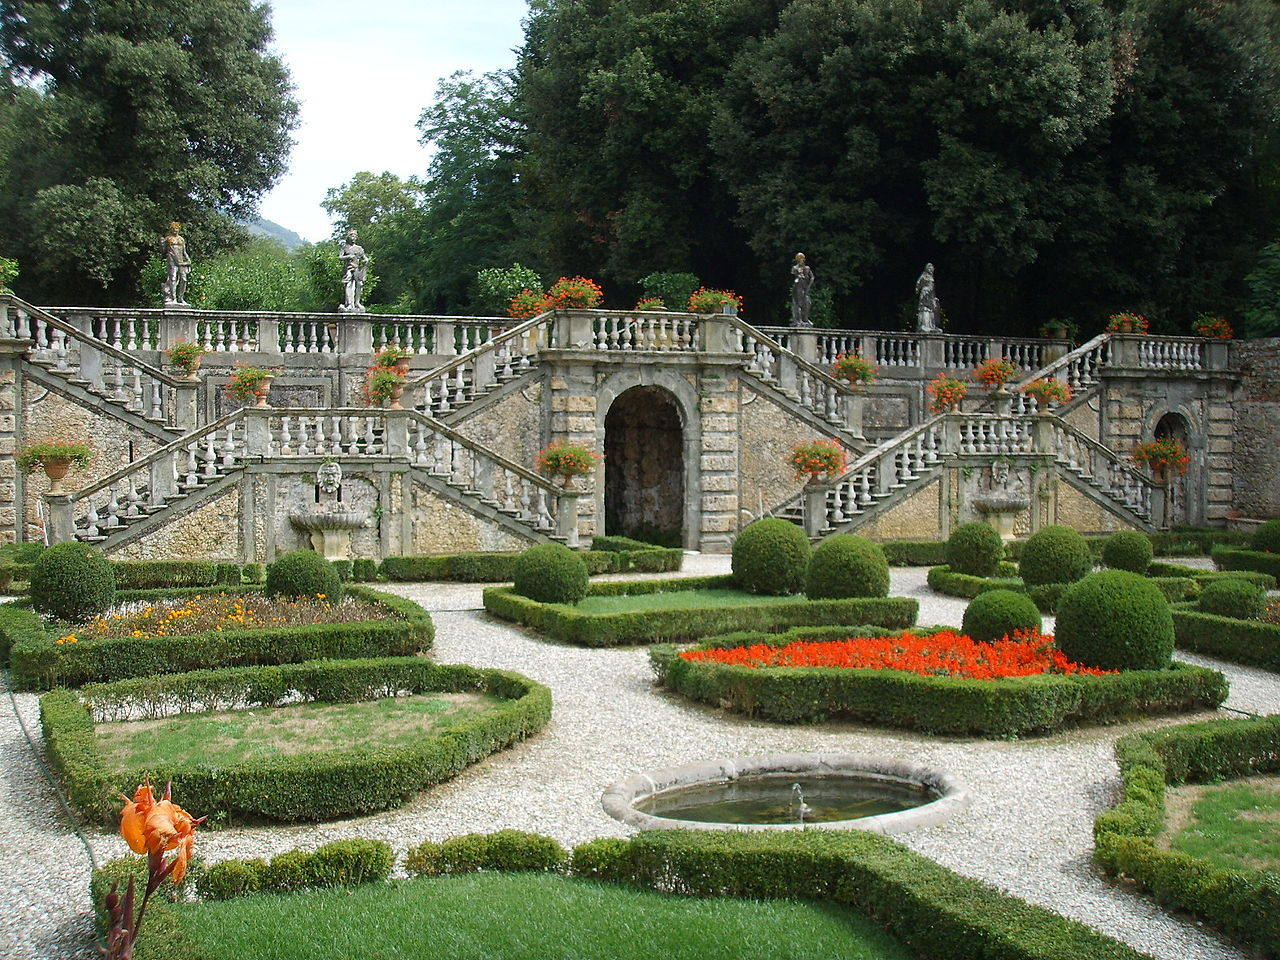 1280px-Villa_torrigiani_di_lucca,_scalinata